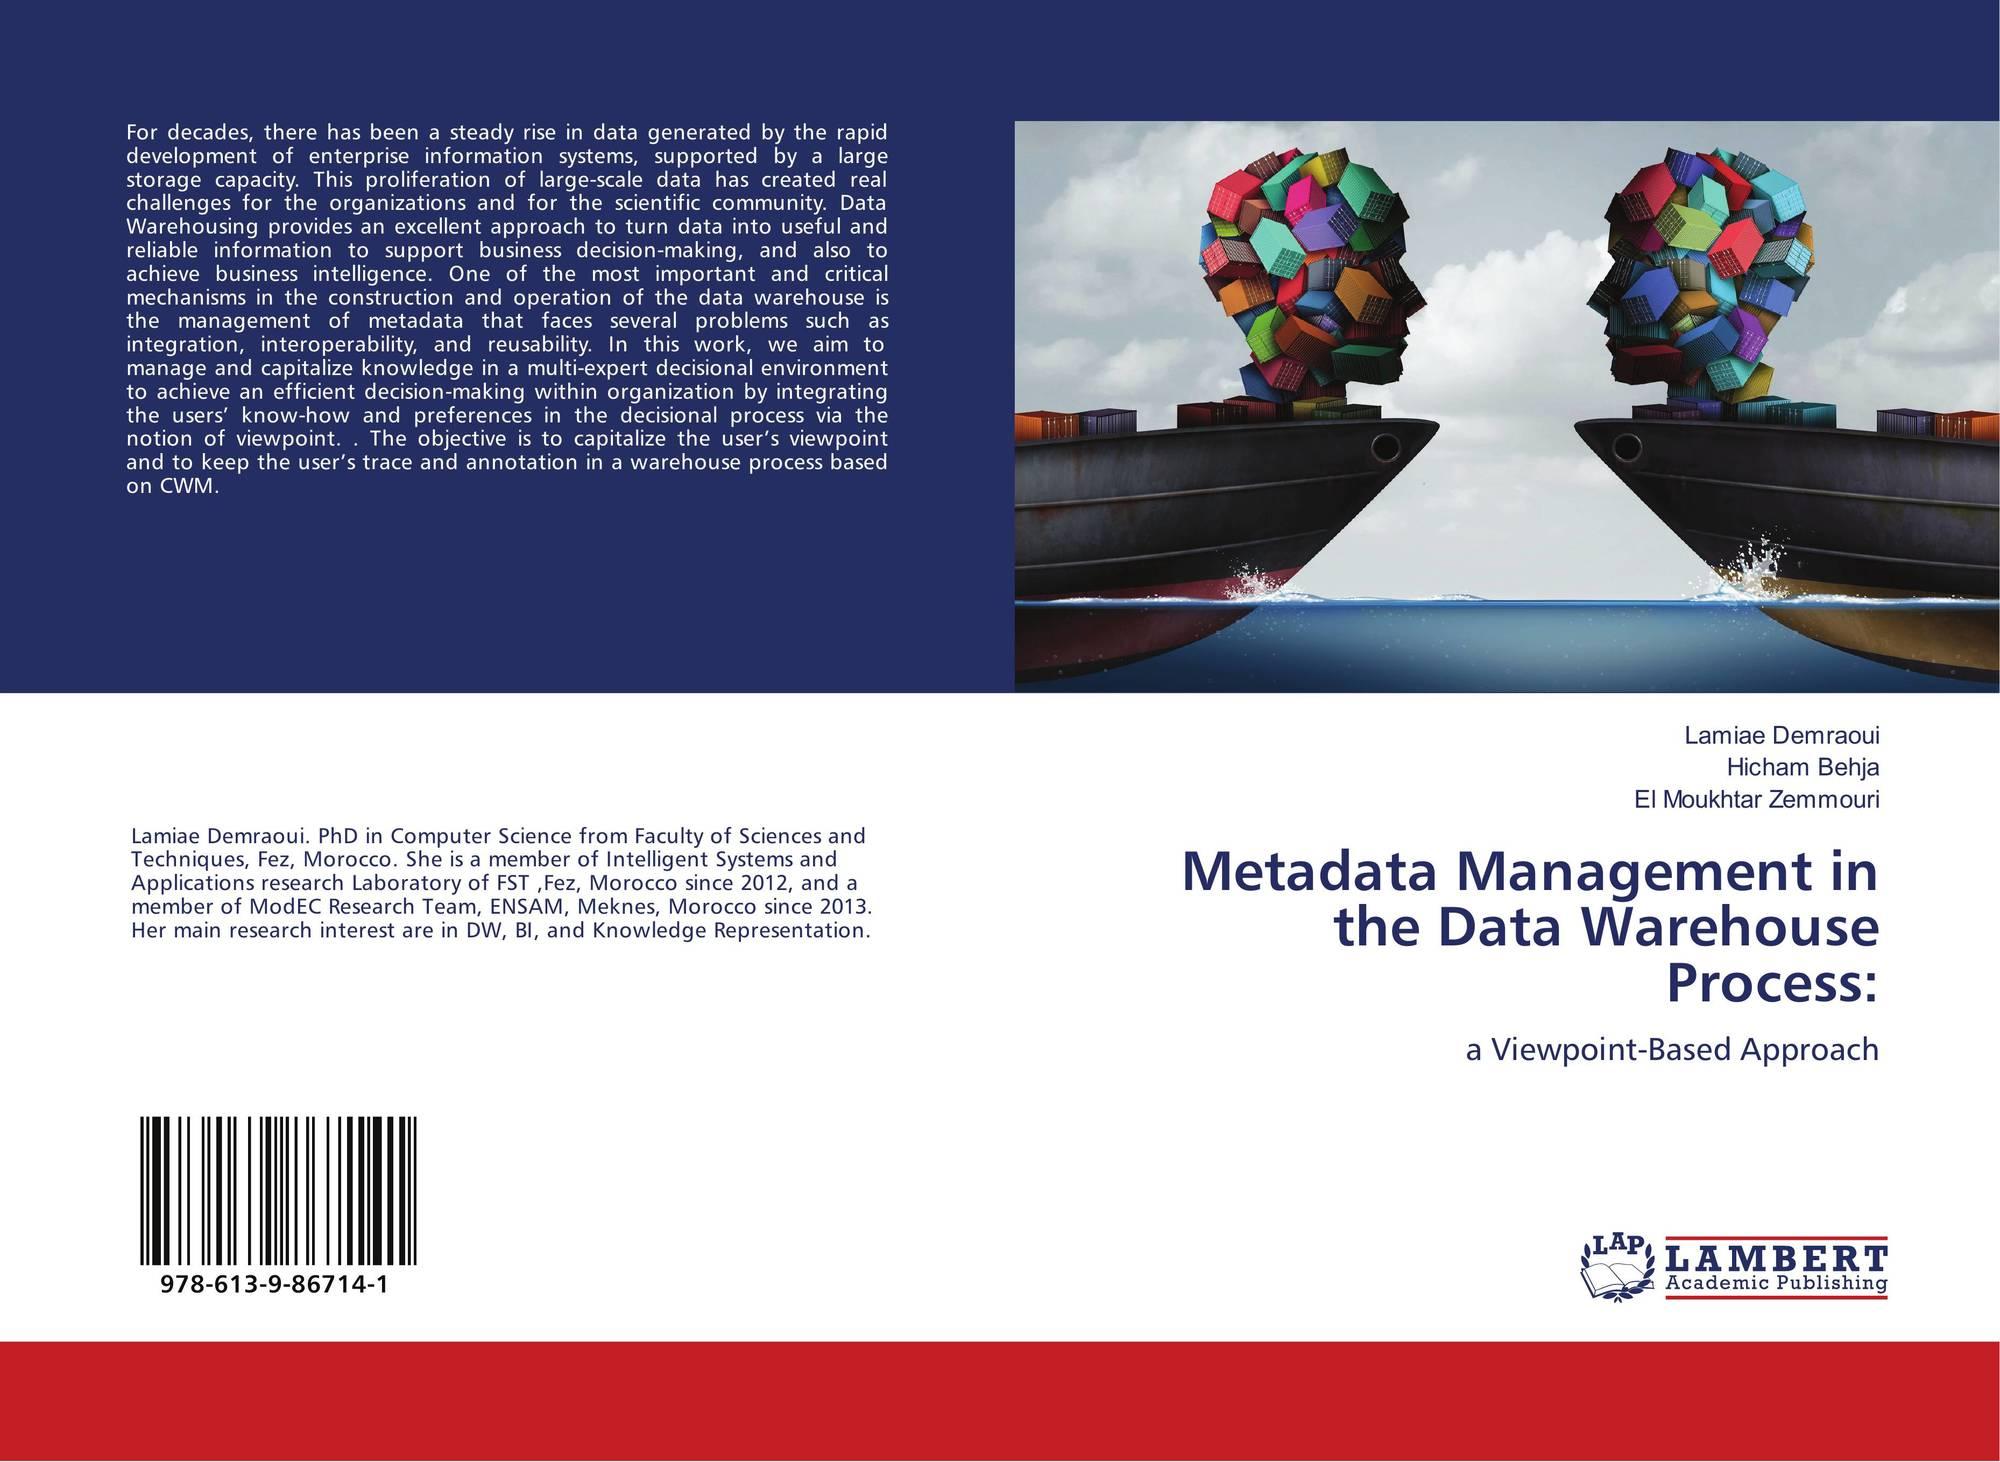 Metadata Management in the Data Warehouse Process:, 978-613-9-86714